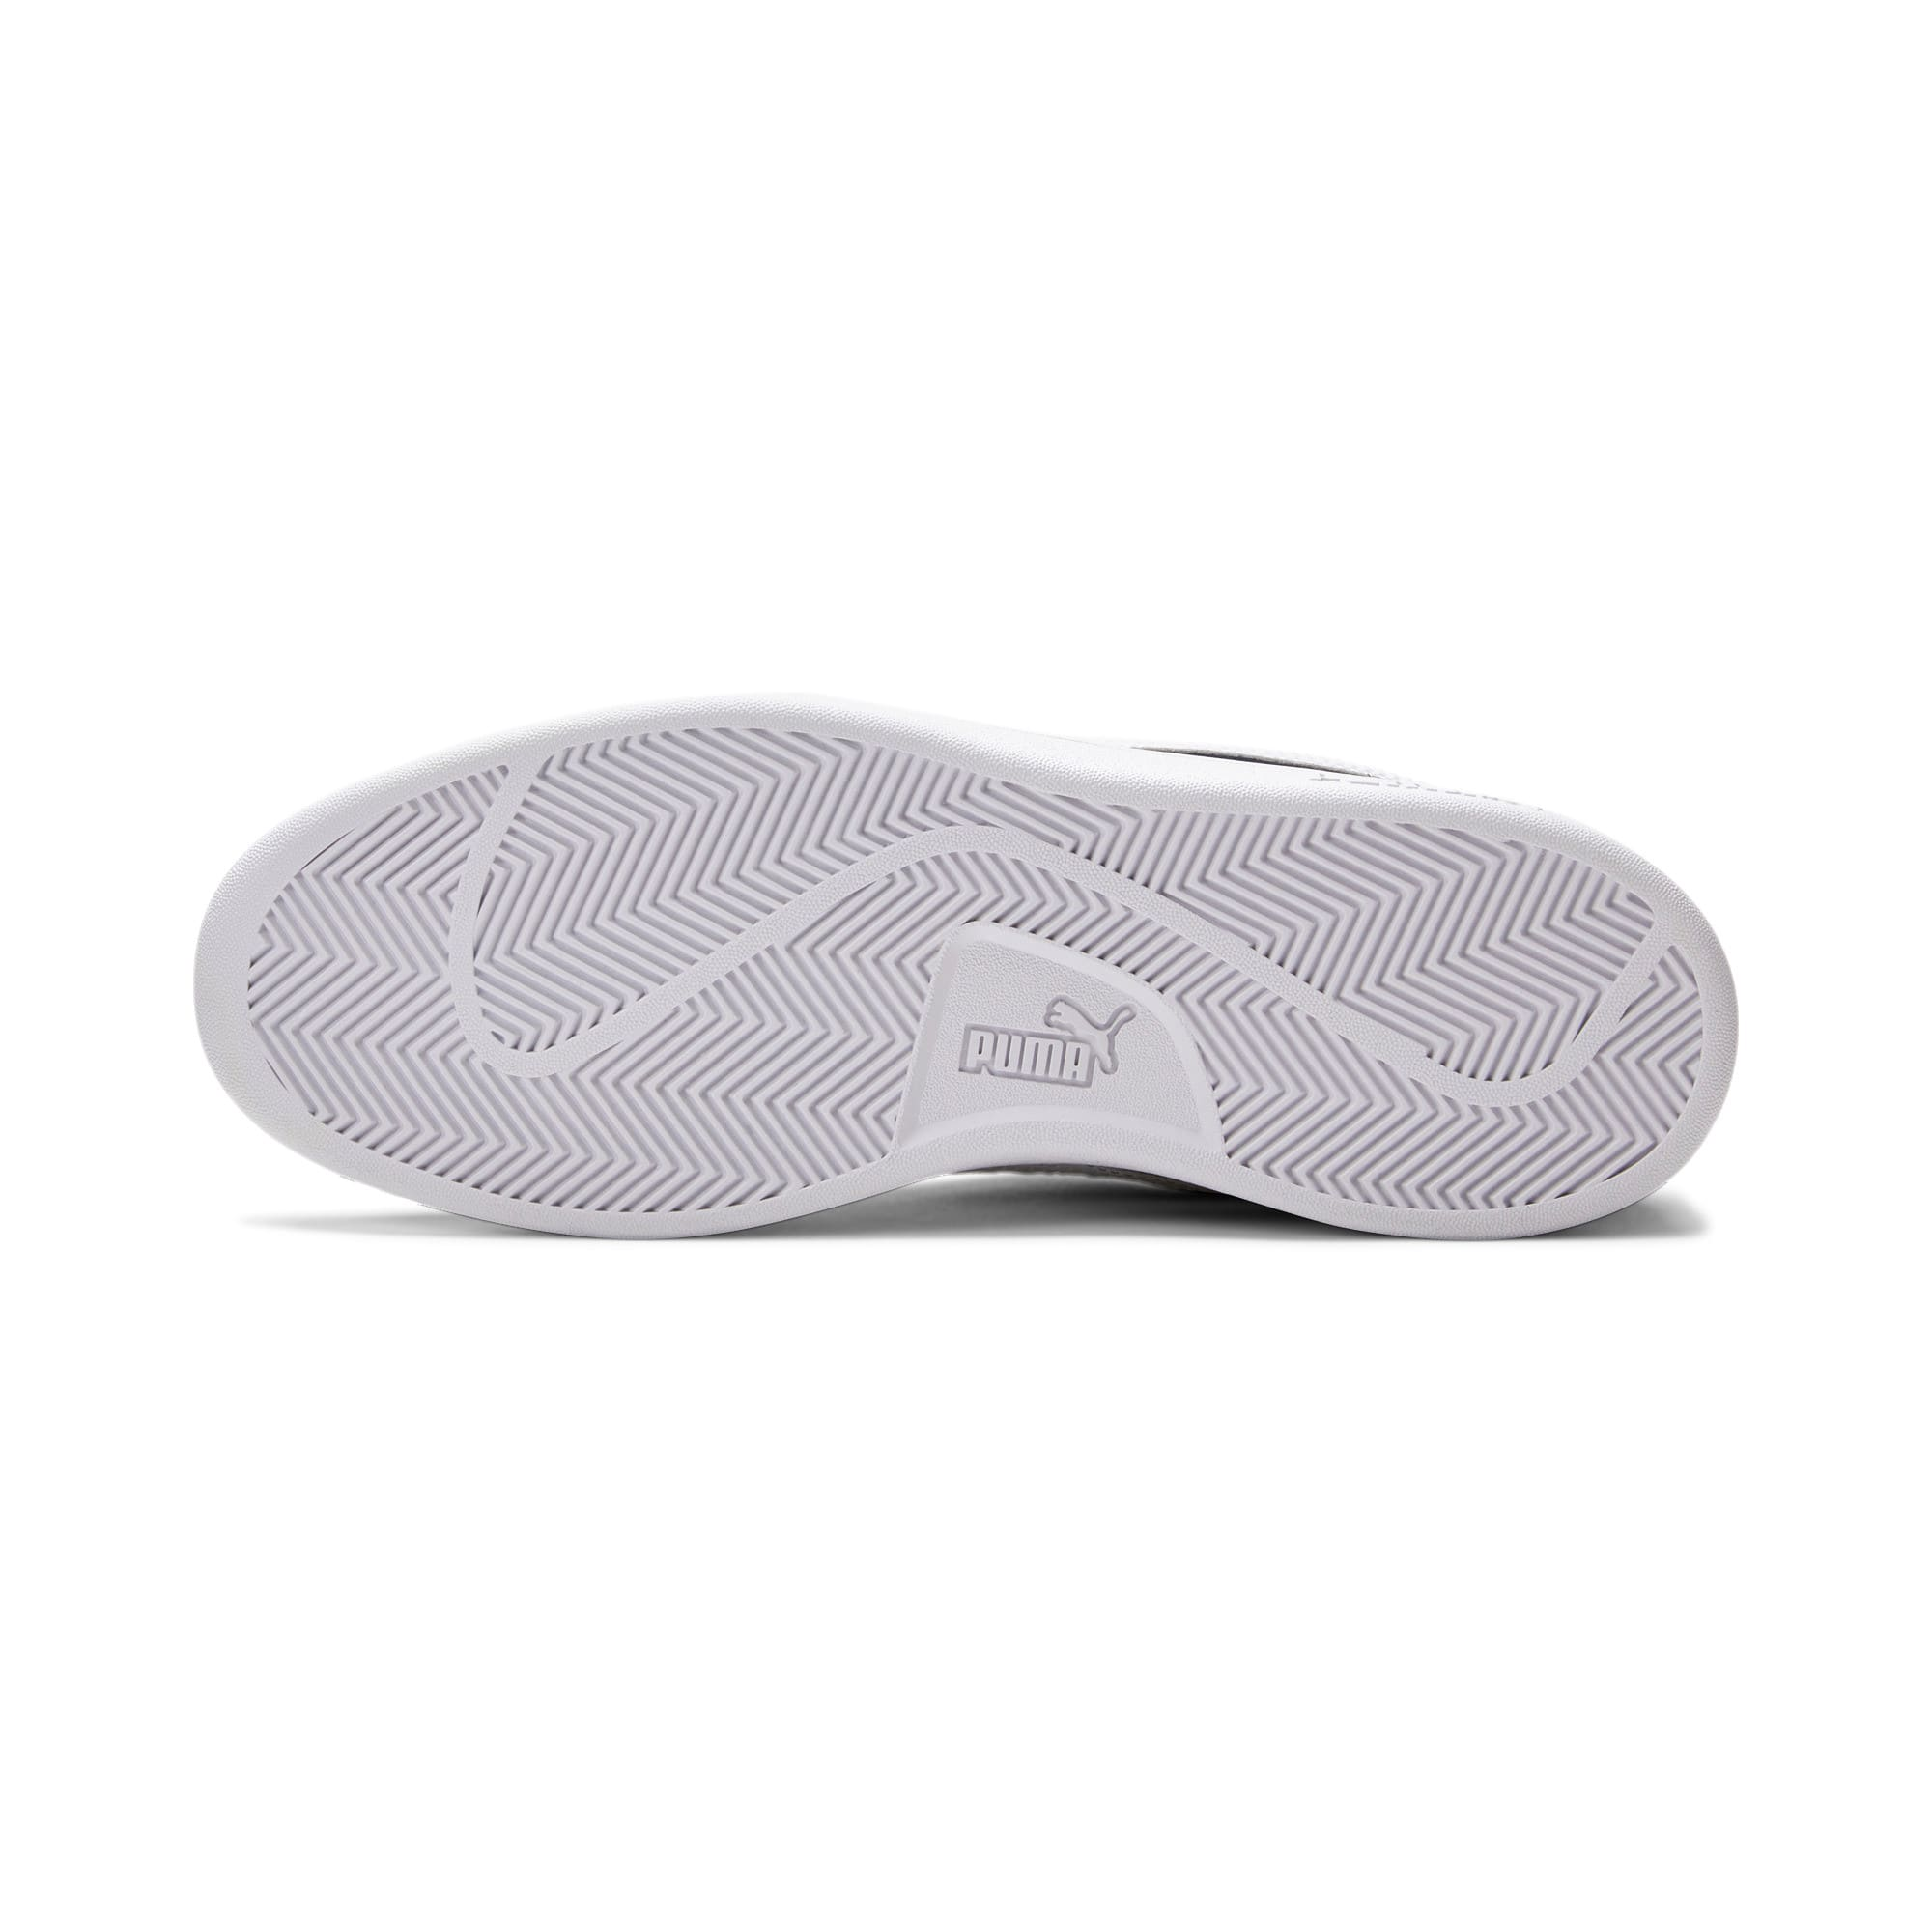 Thumbnail 4 of PUMA Smash v2 Sneakers, Peacoat-Puma White, medium